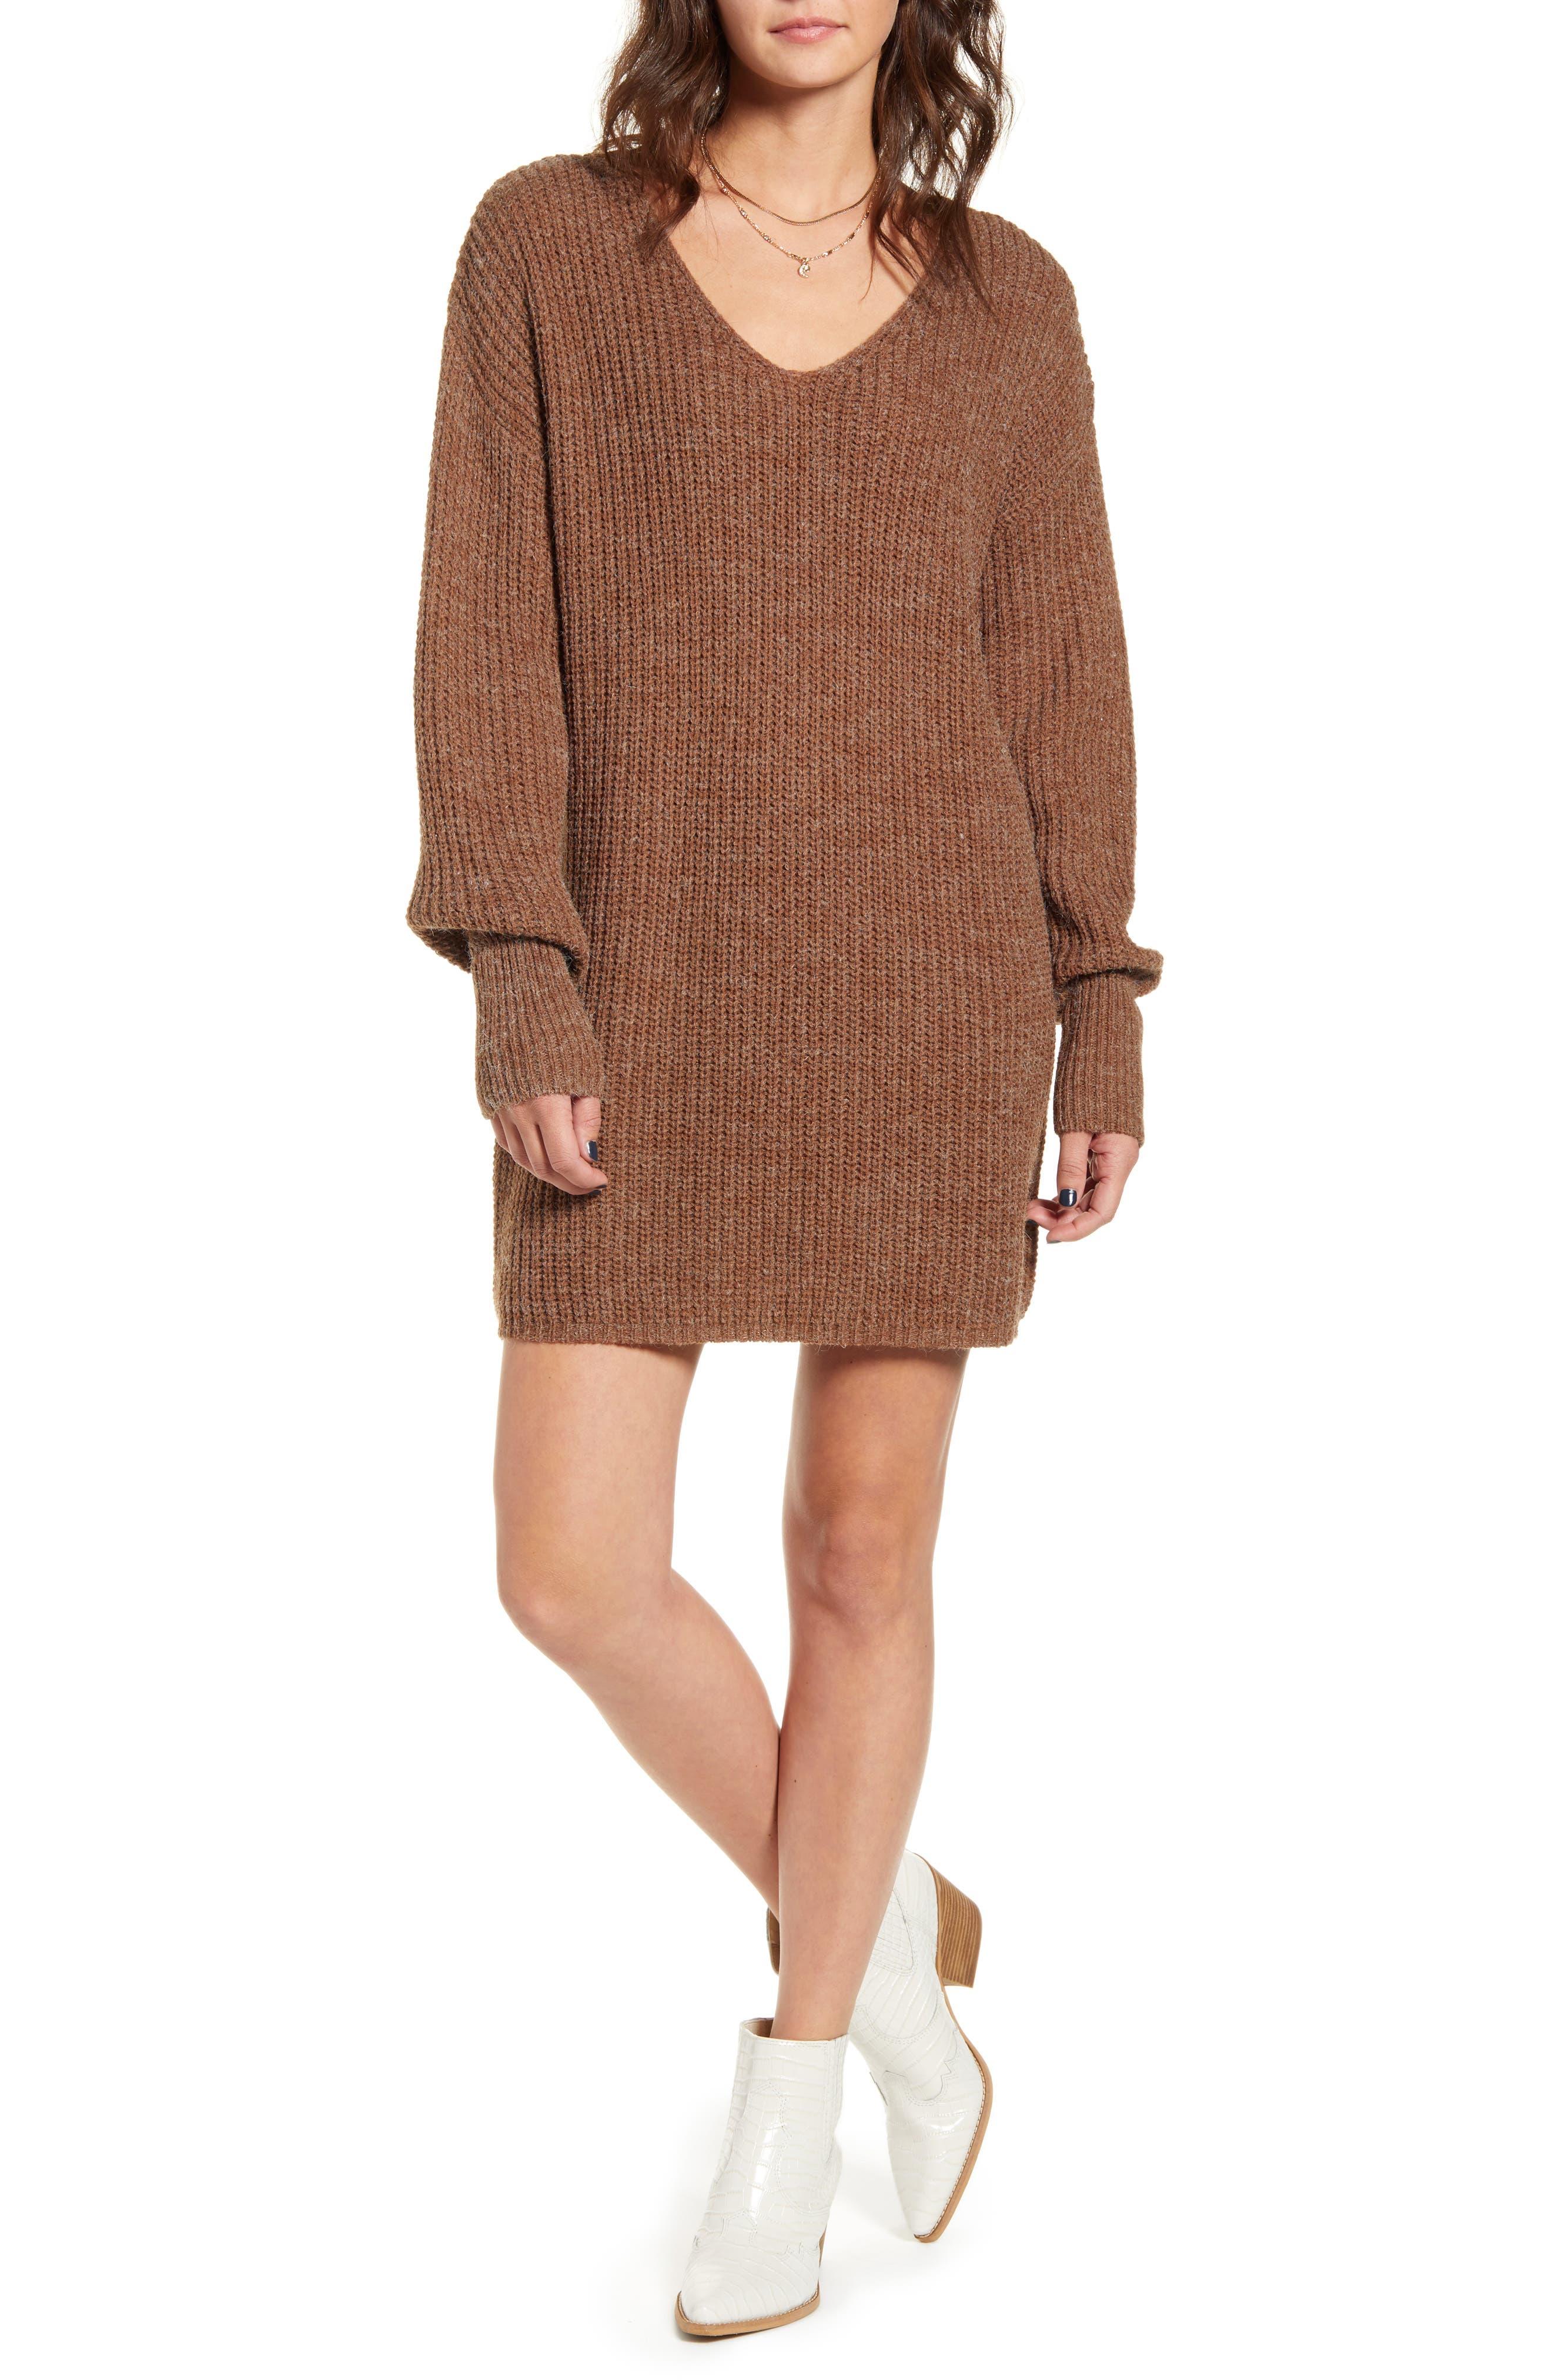 All in Favor U-Neck Sweater Dress